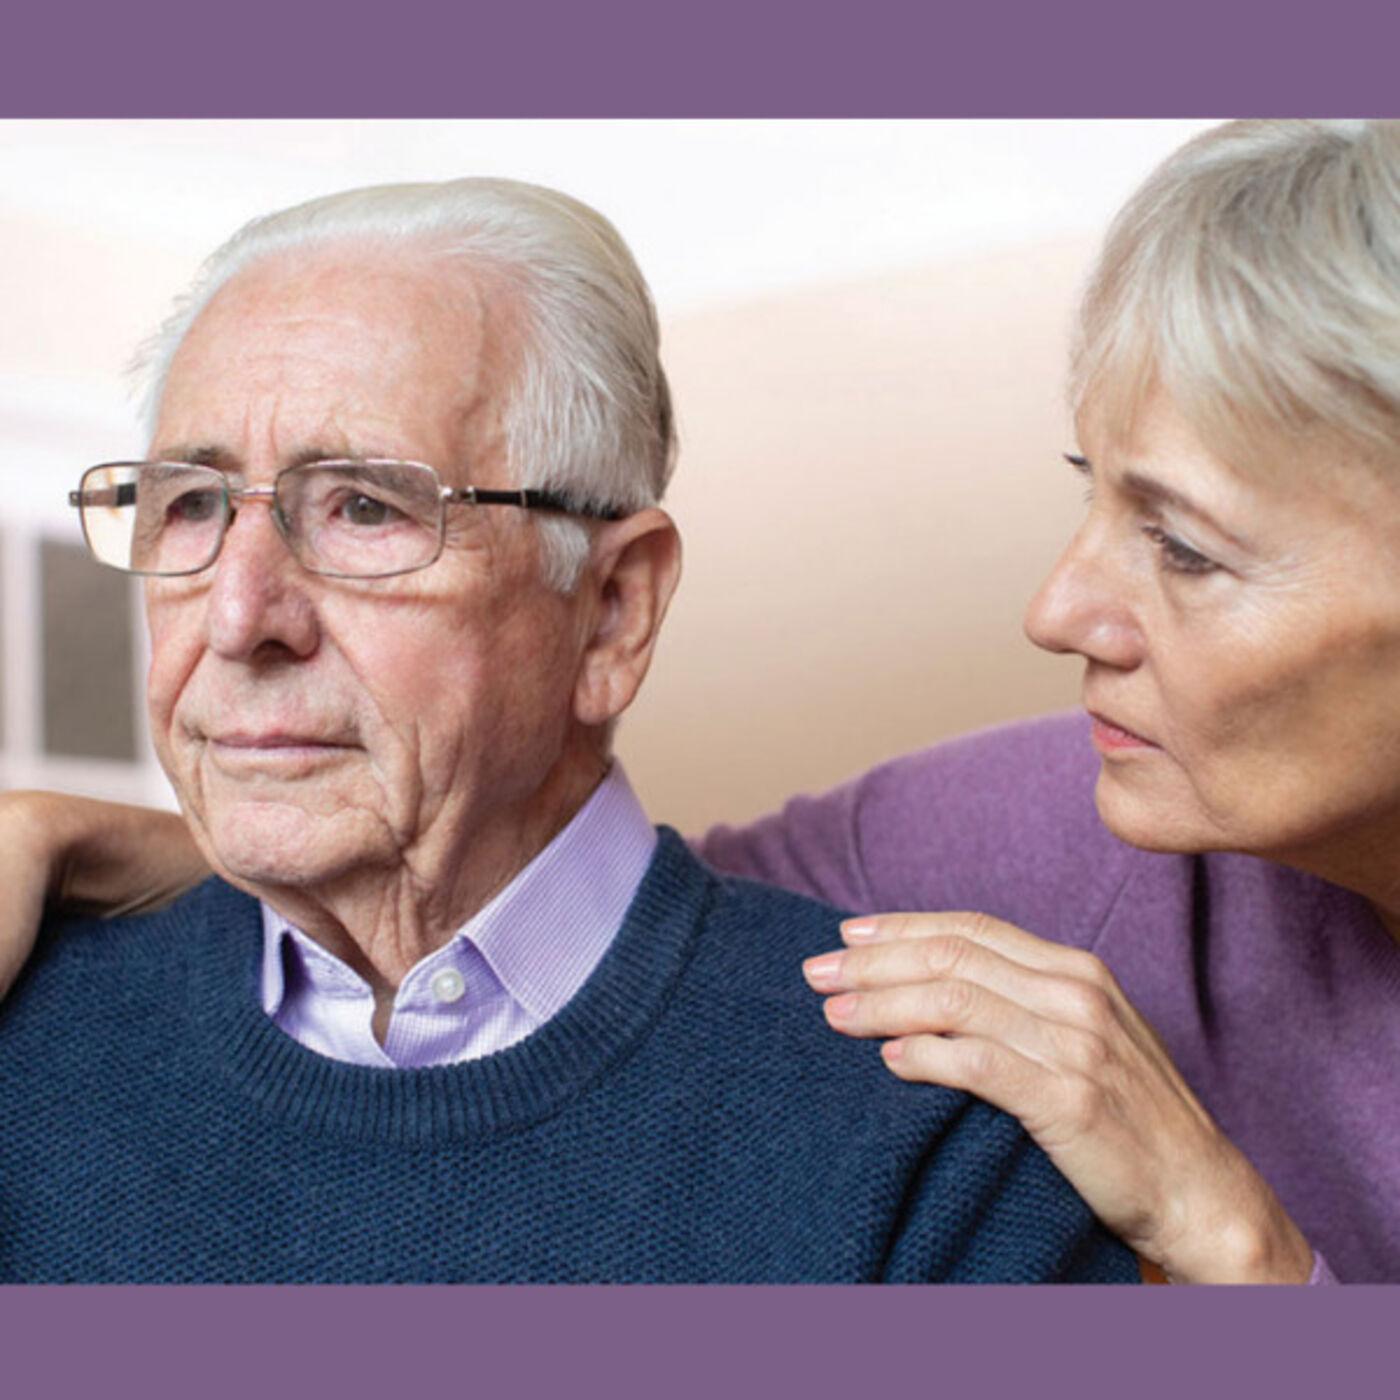 Losing Yourself in Caregiving